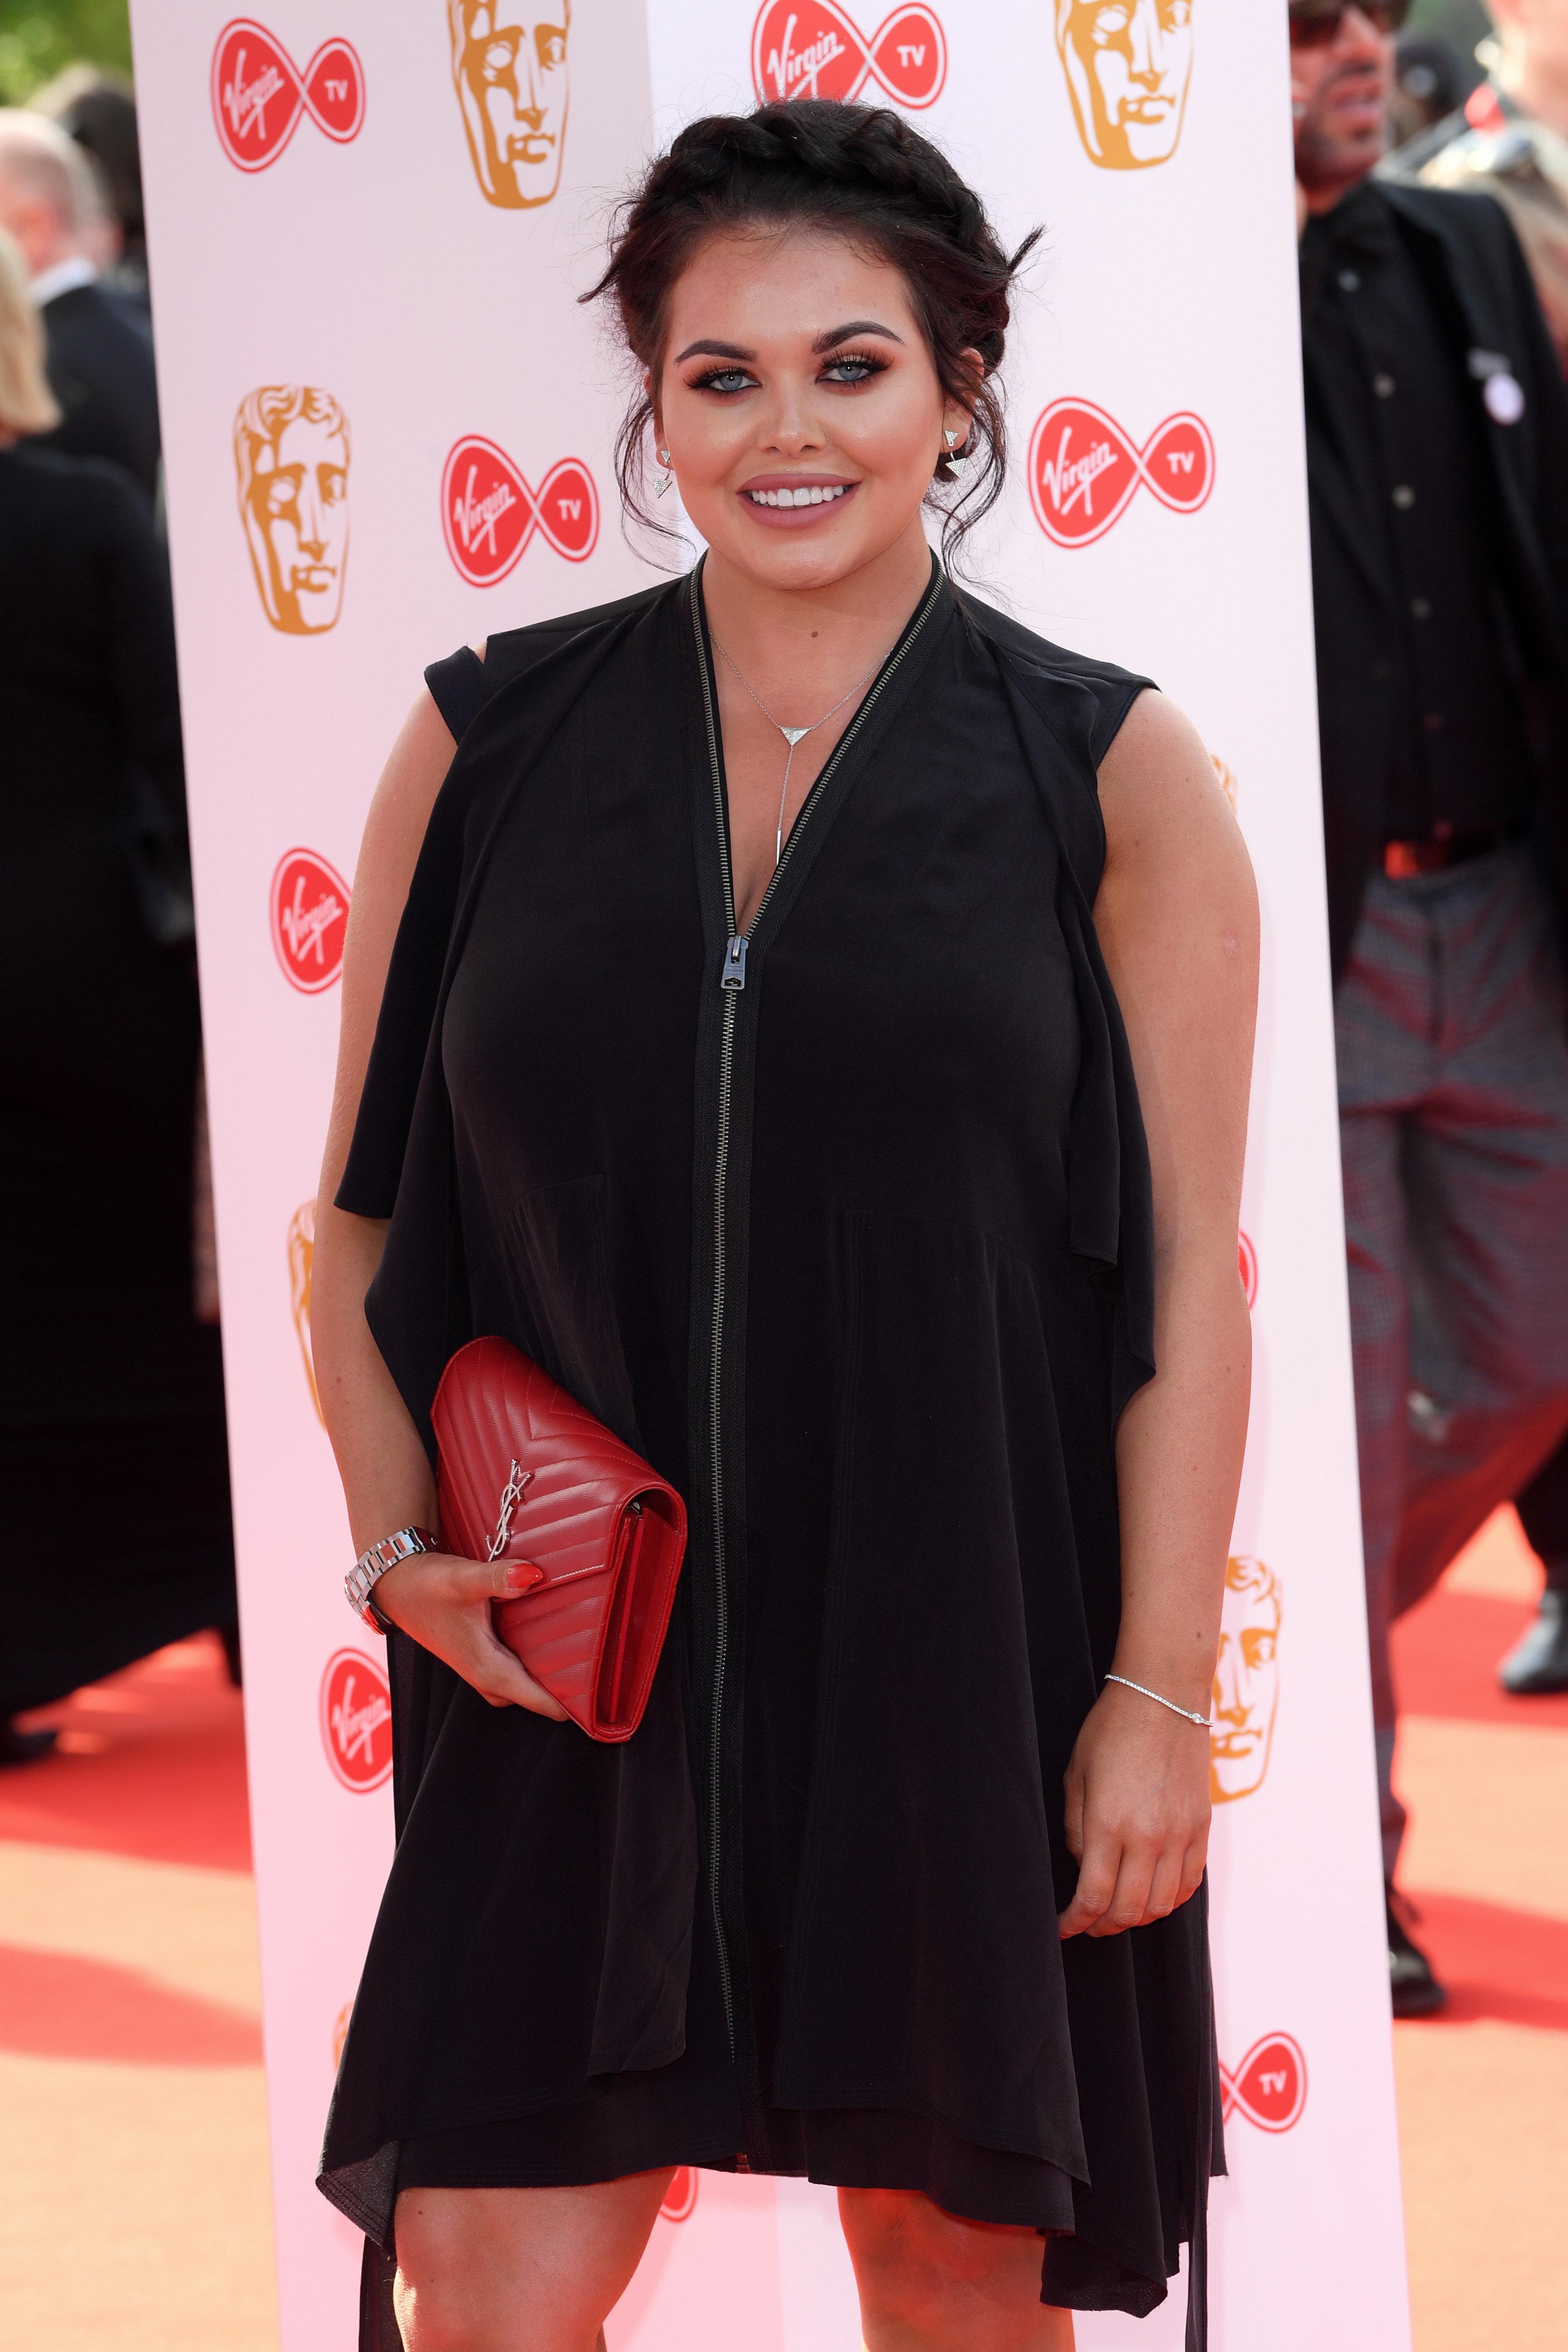 Scarlett Moffatt Hits Back At Body-Shaming Trolls After Being Left In Tears By Negative